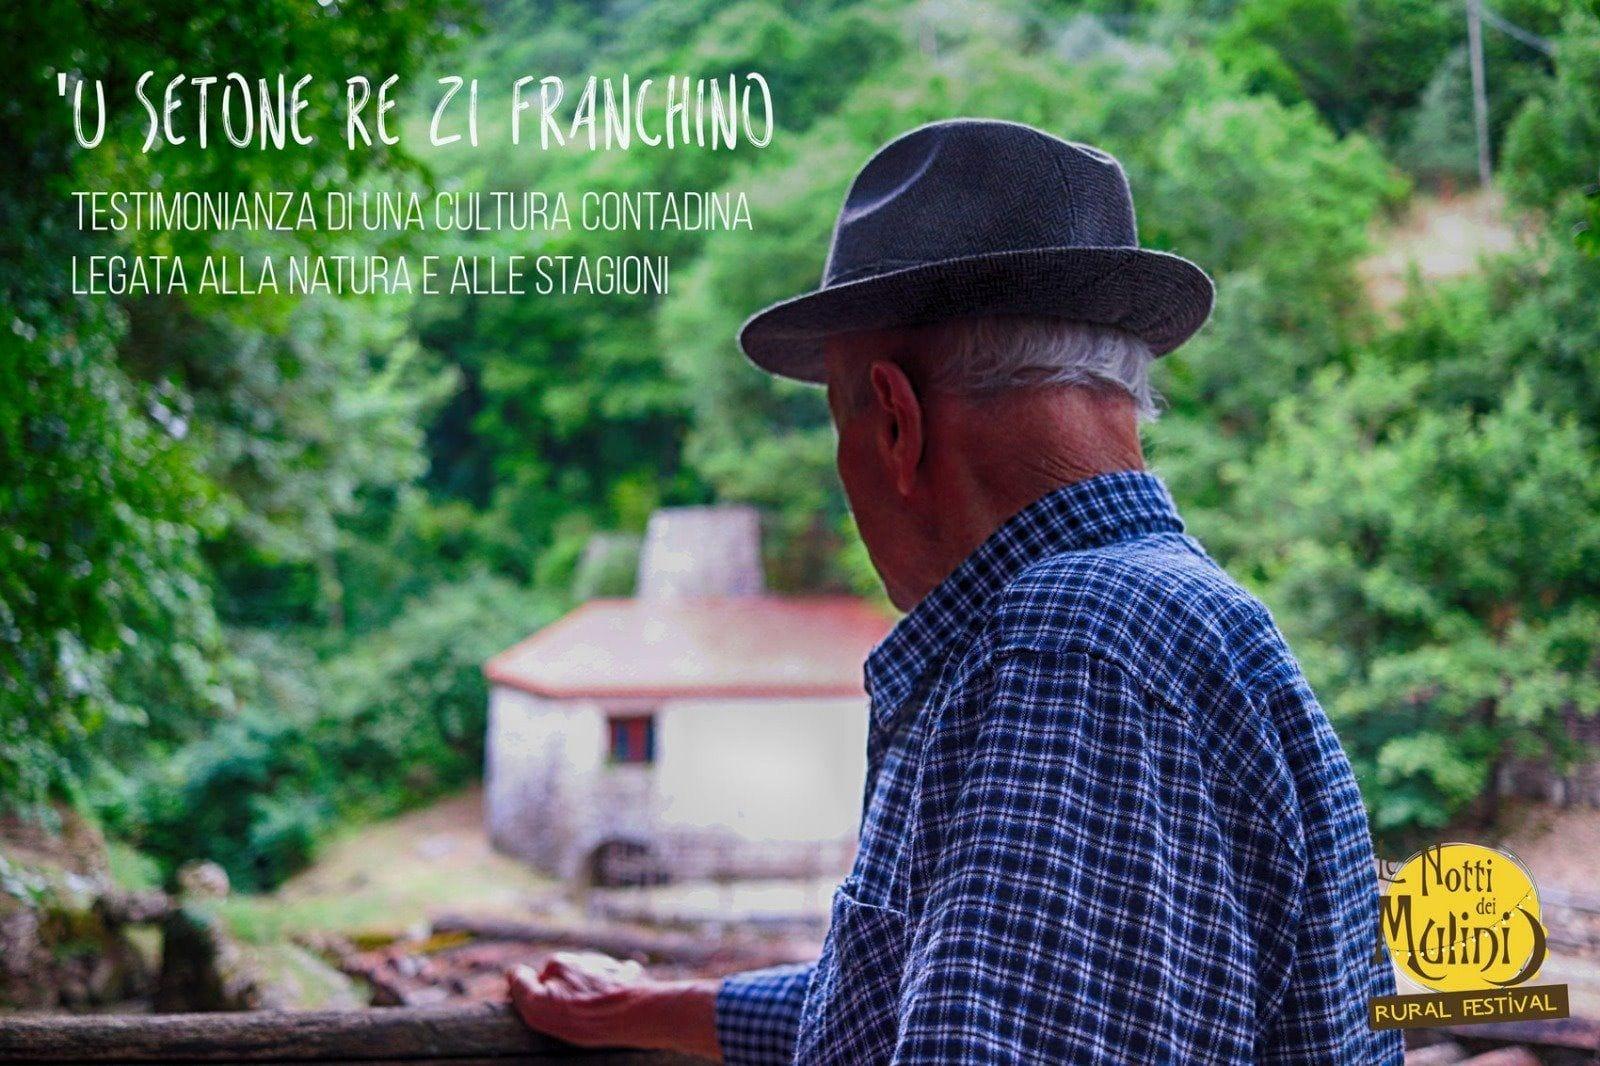 zi' Franghino-2